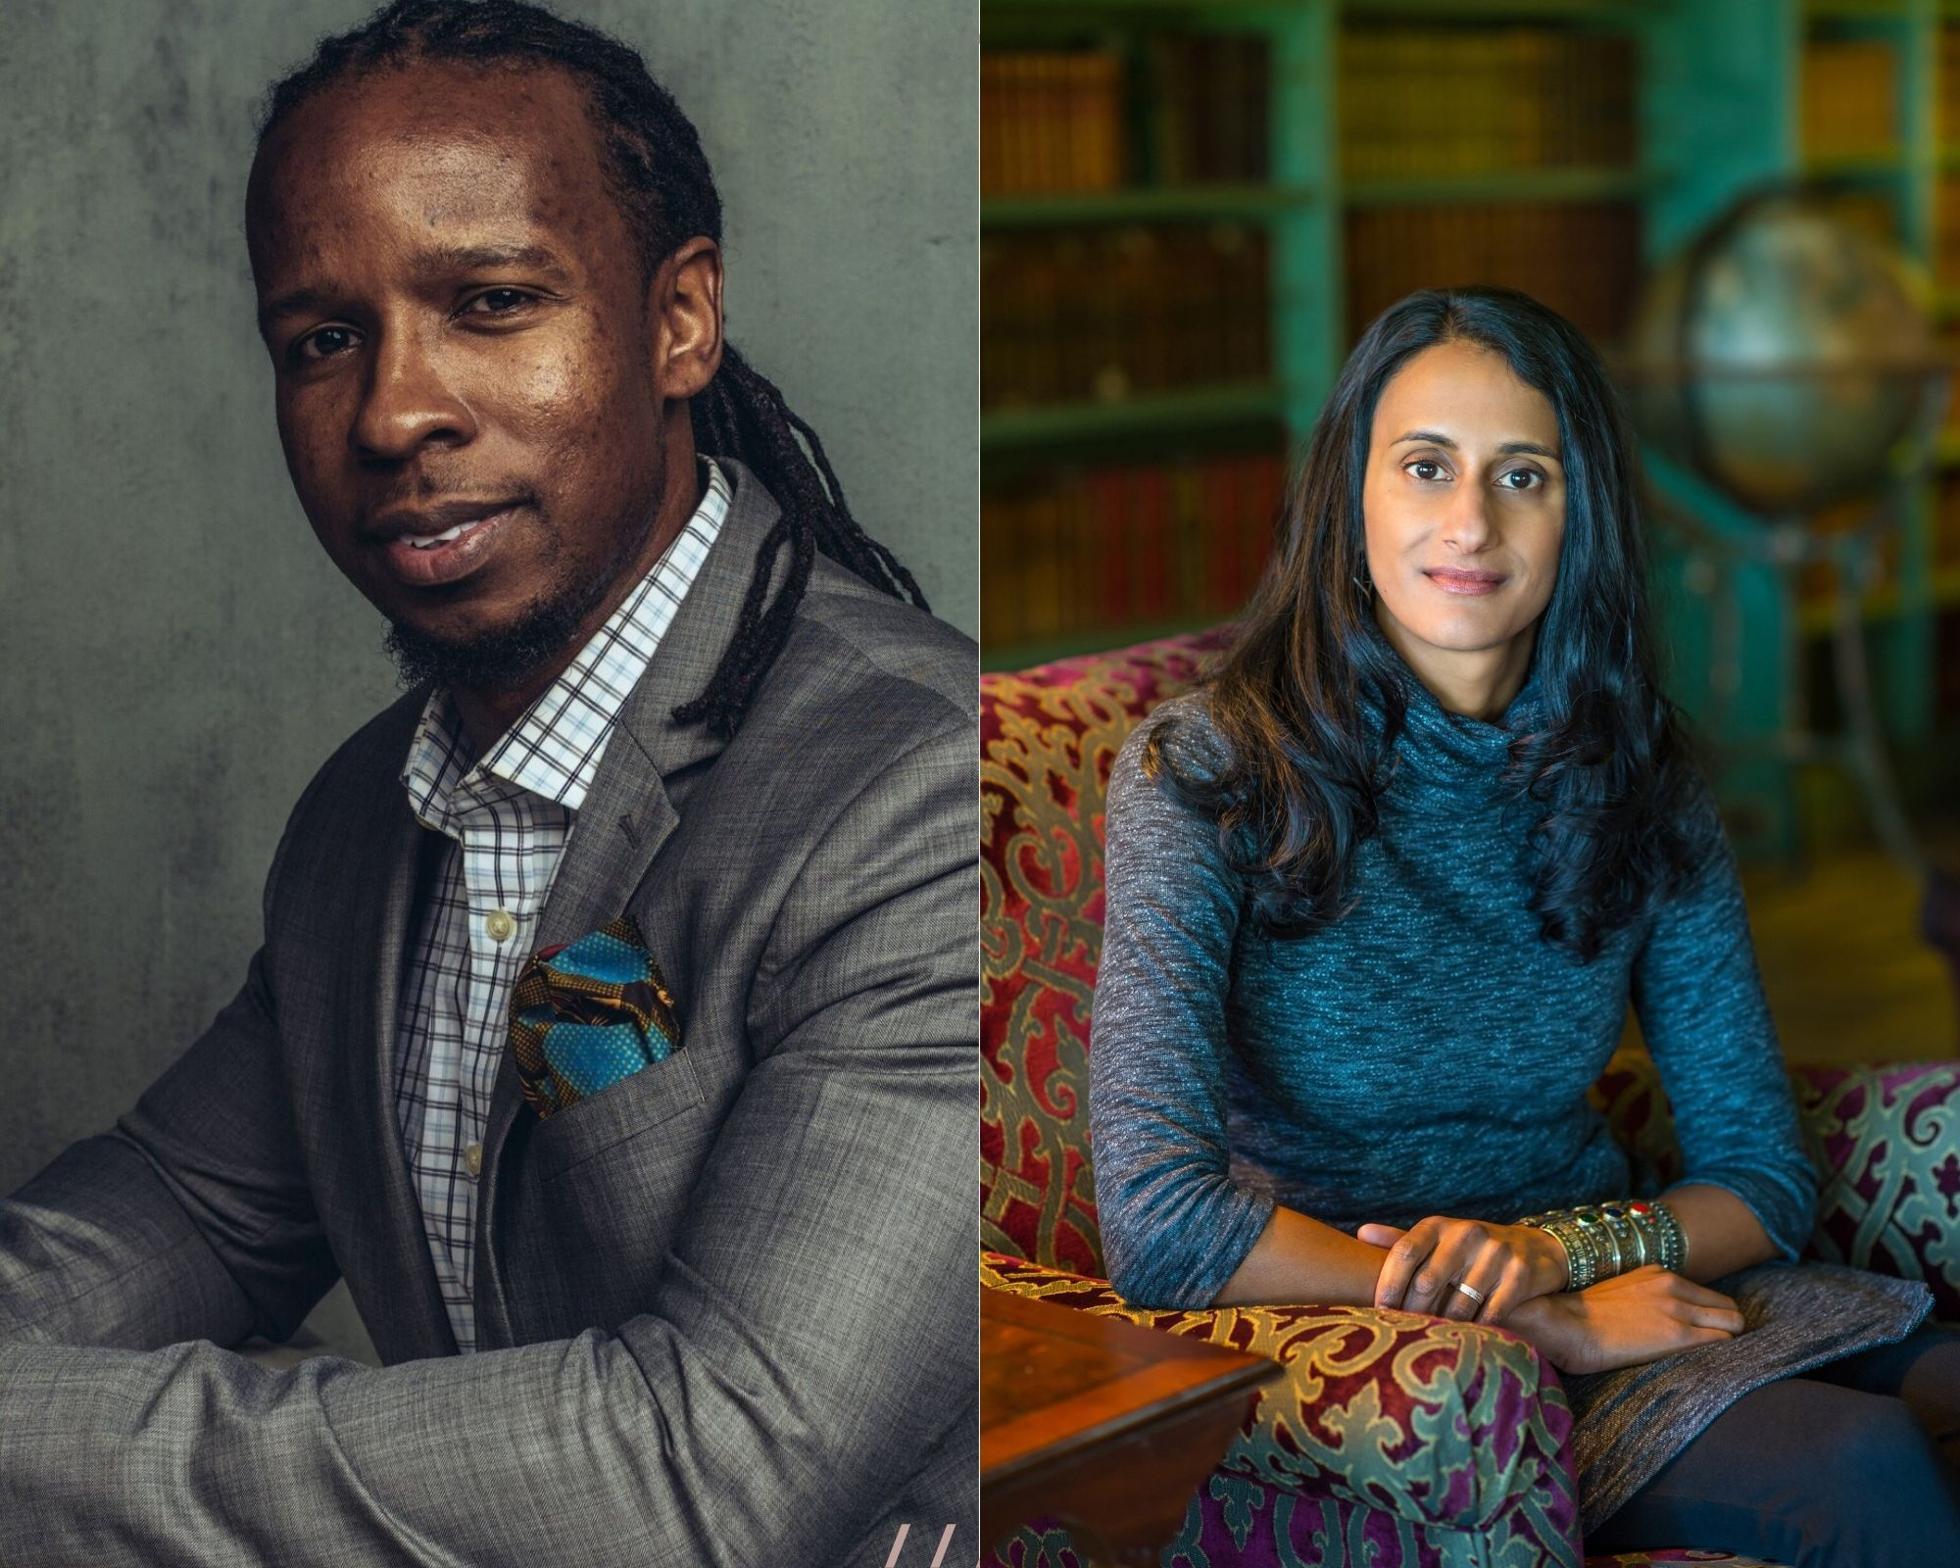 Ibram X. Kendi and Bina Venkataraman are the cofounders of The Emancipator.